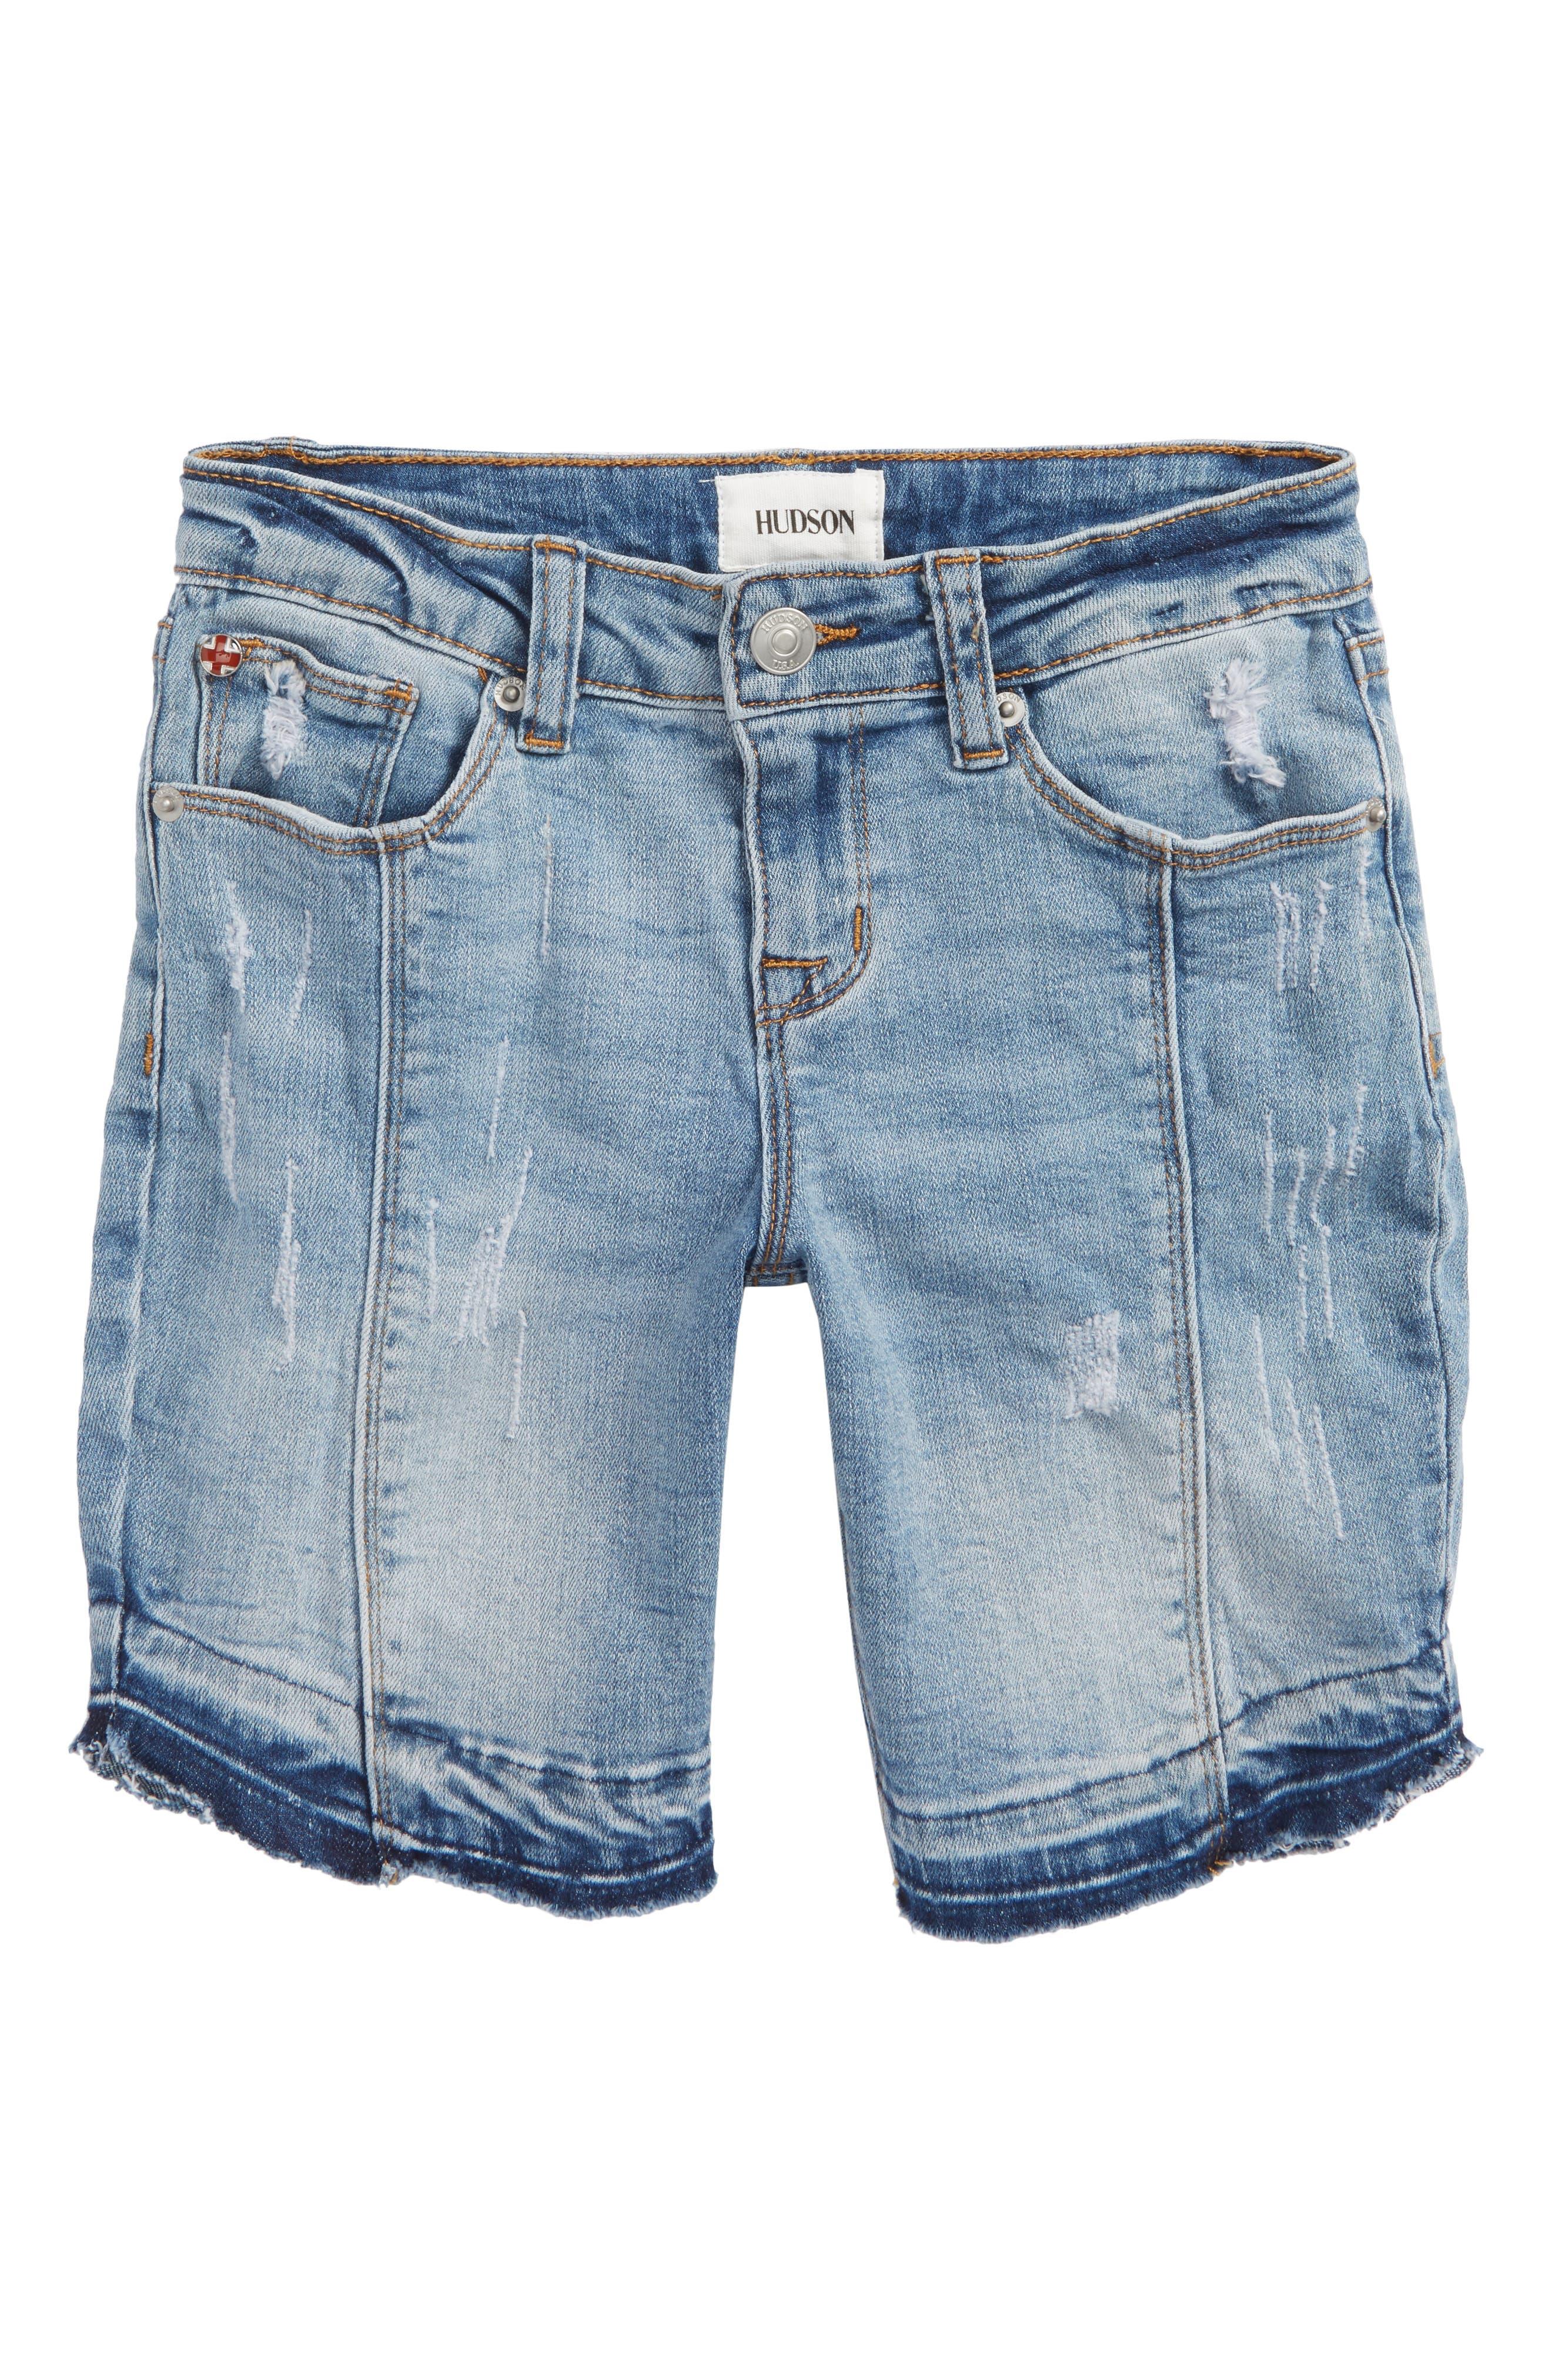 Release Hem Distressed Denim Shorts,                             Main thumbnail 1, color,                             400